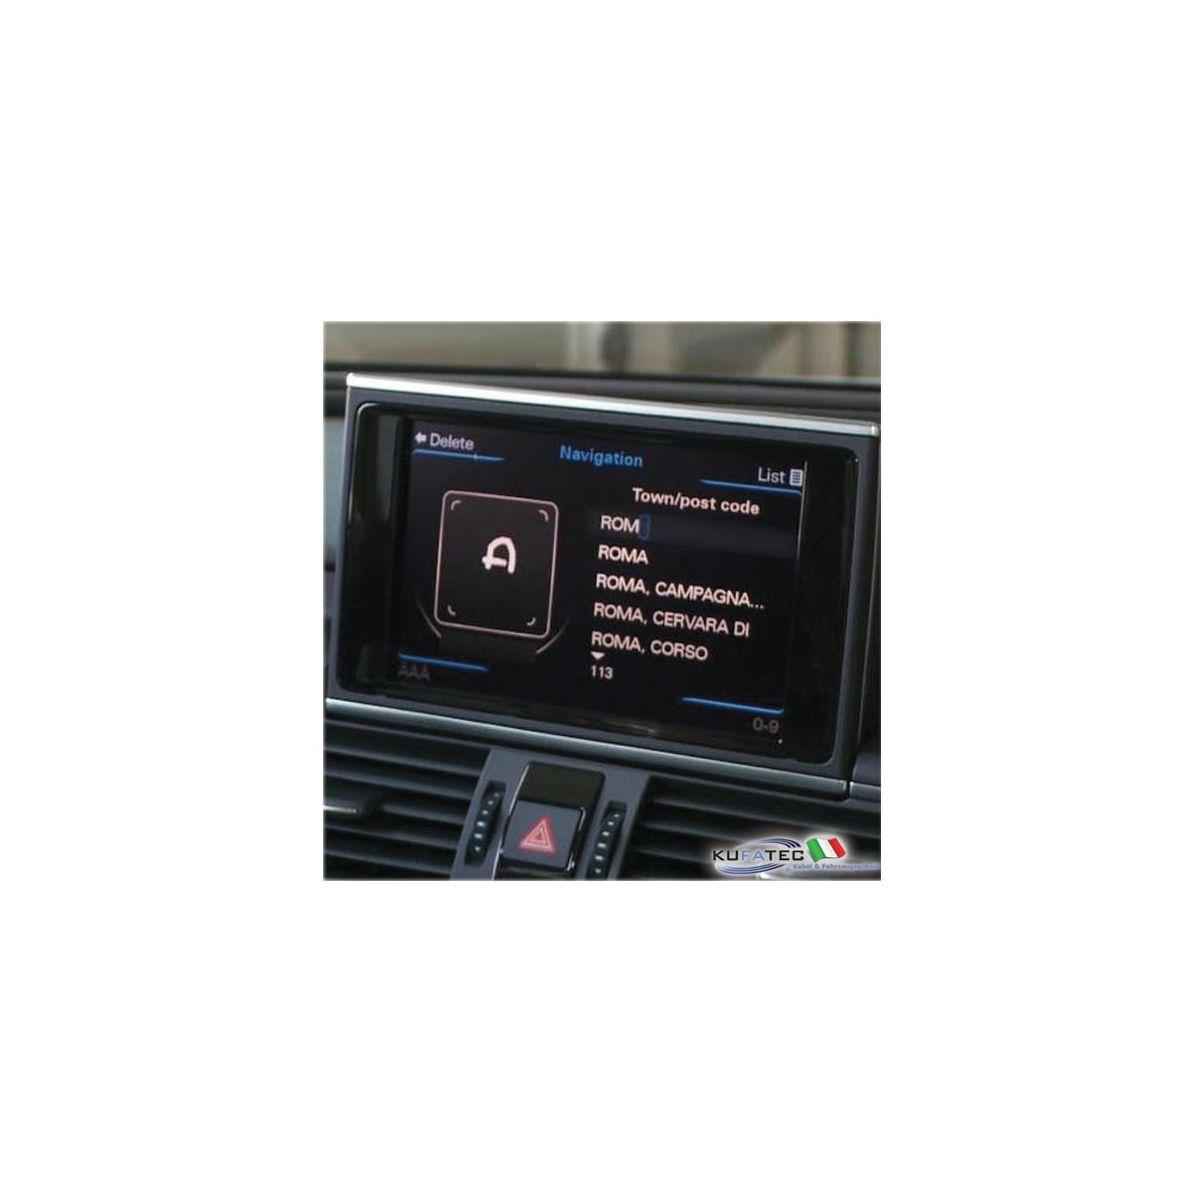 Audi Infotainment Mmi High Incl Navigation Hdd Retrofit Audi A6 4g A7 4g Navistore